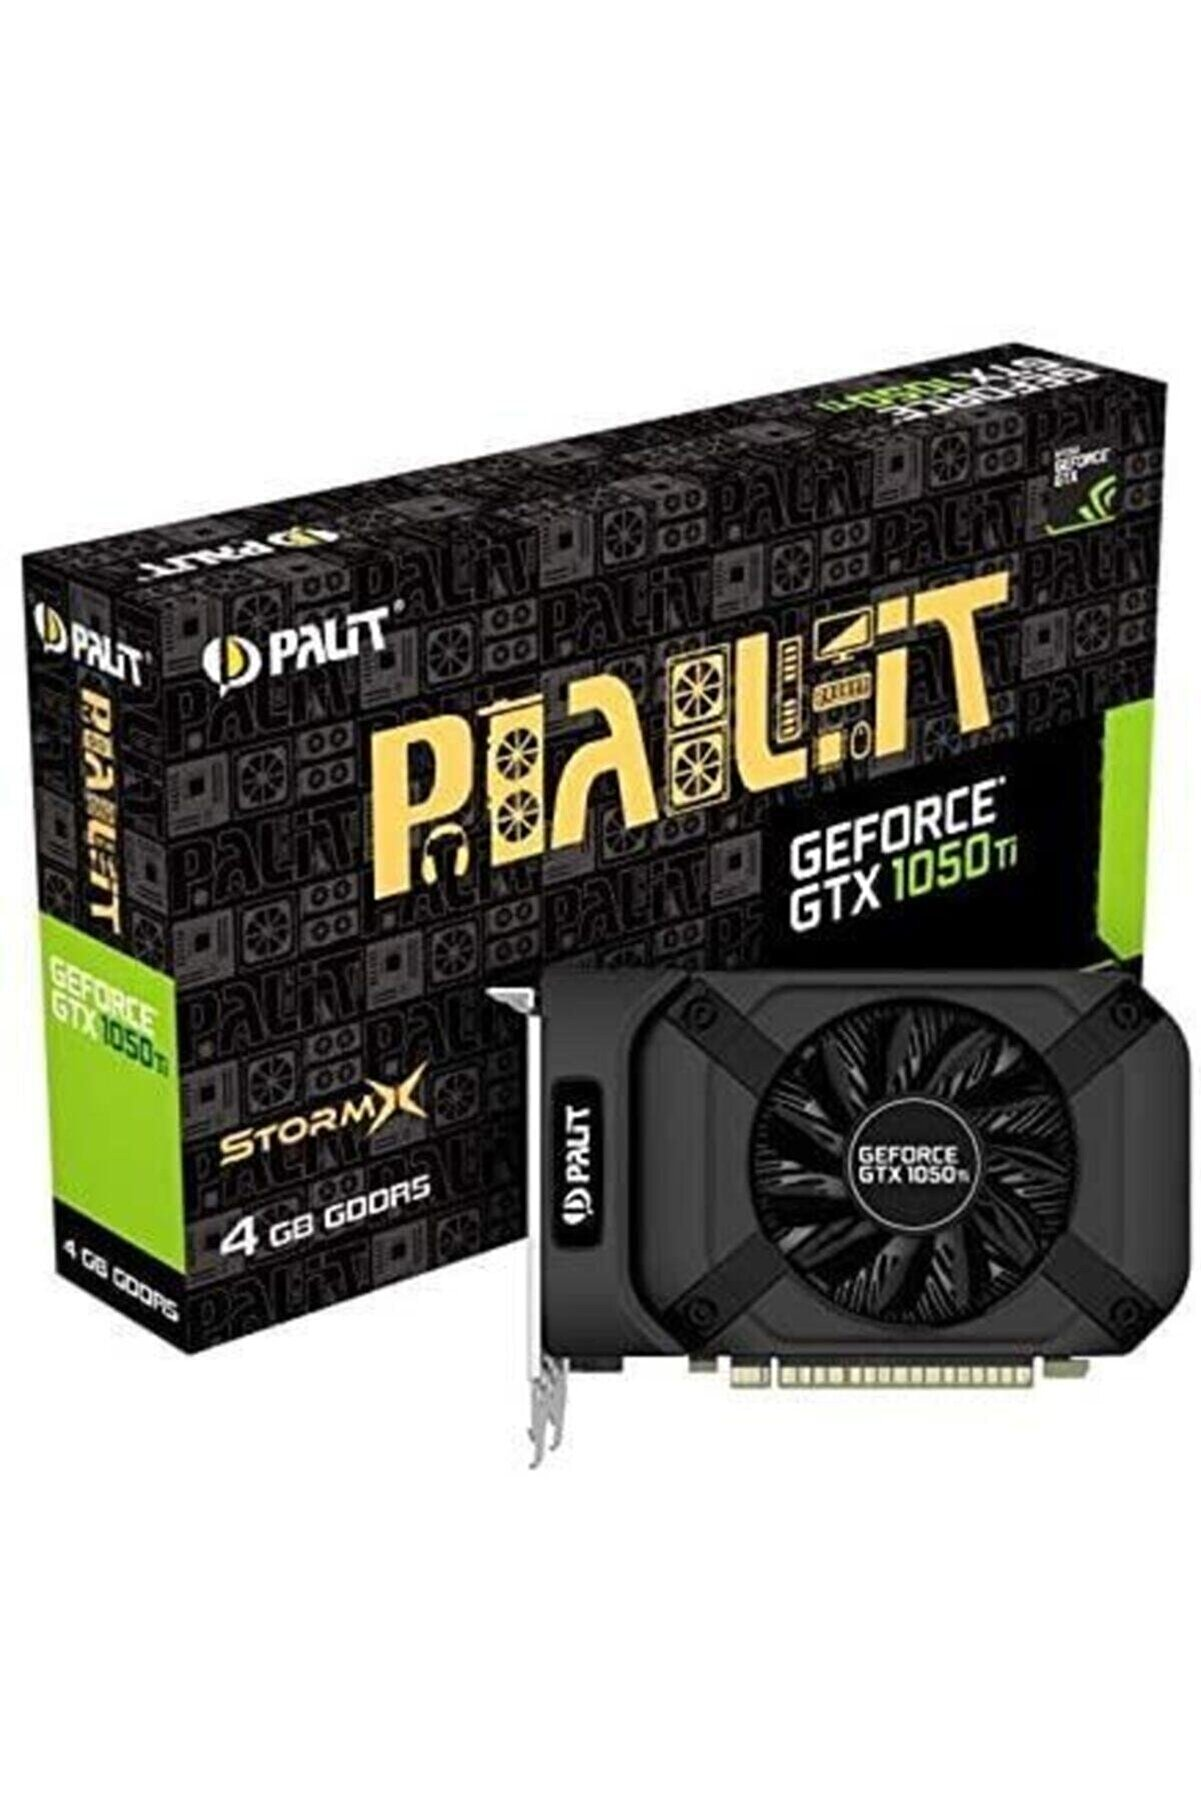 PALIT Gtx1050 Ti Stormx 4gb 128bit Gddr5